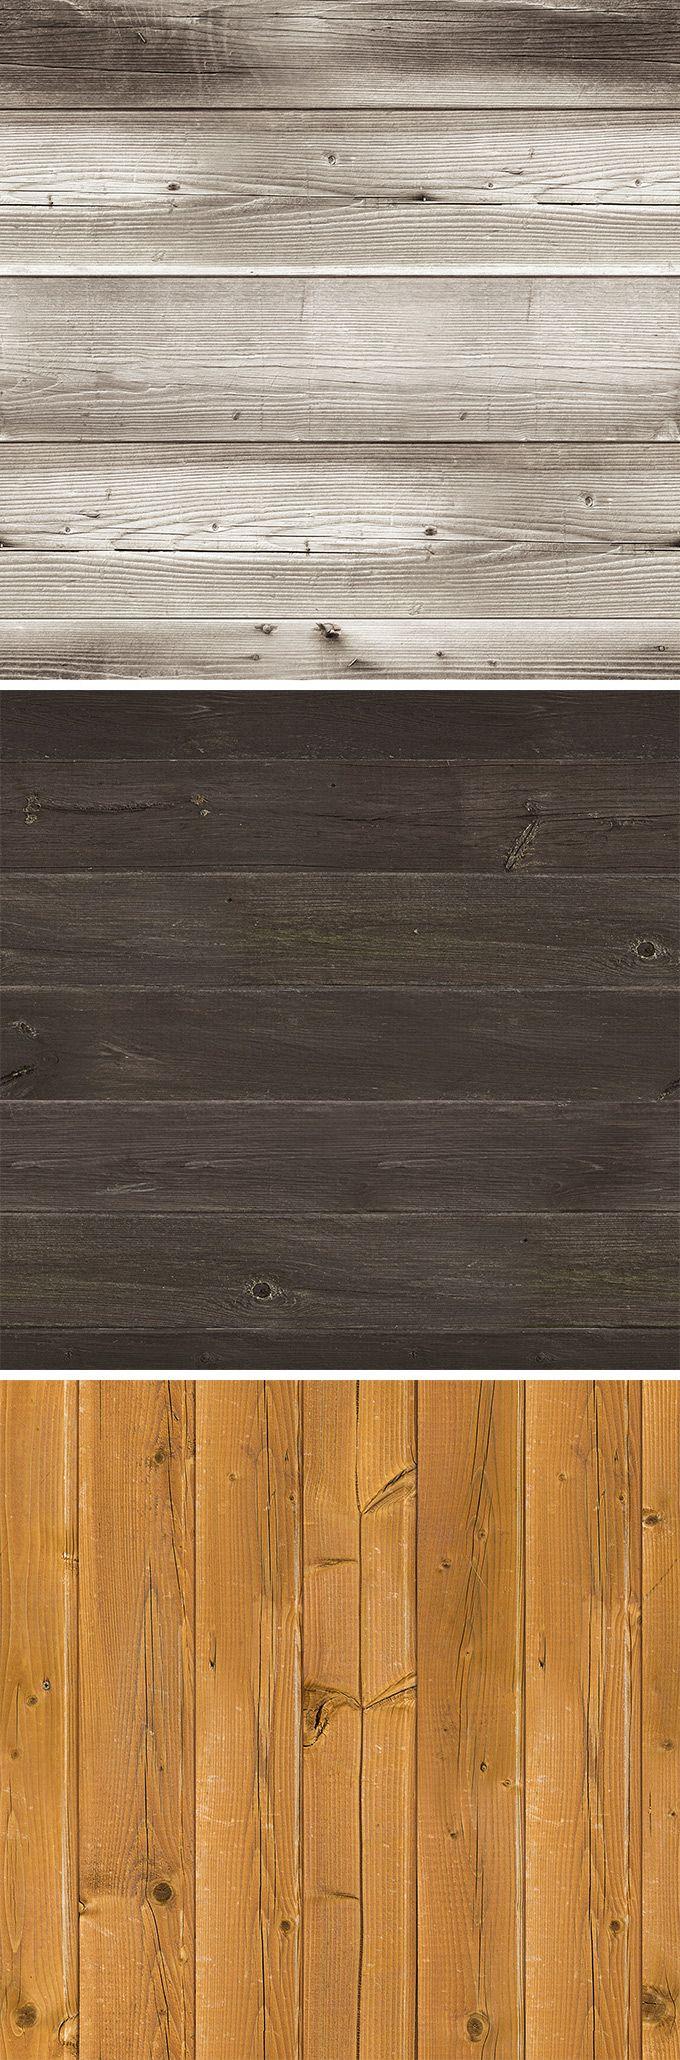 Free 3 Hi-Res Seamless Wood Textures (20MB) | pixelbuddha.net